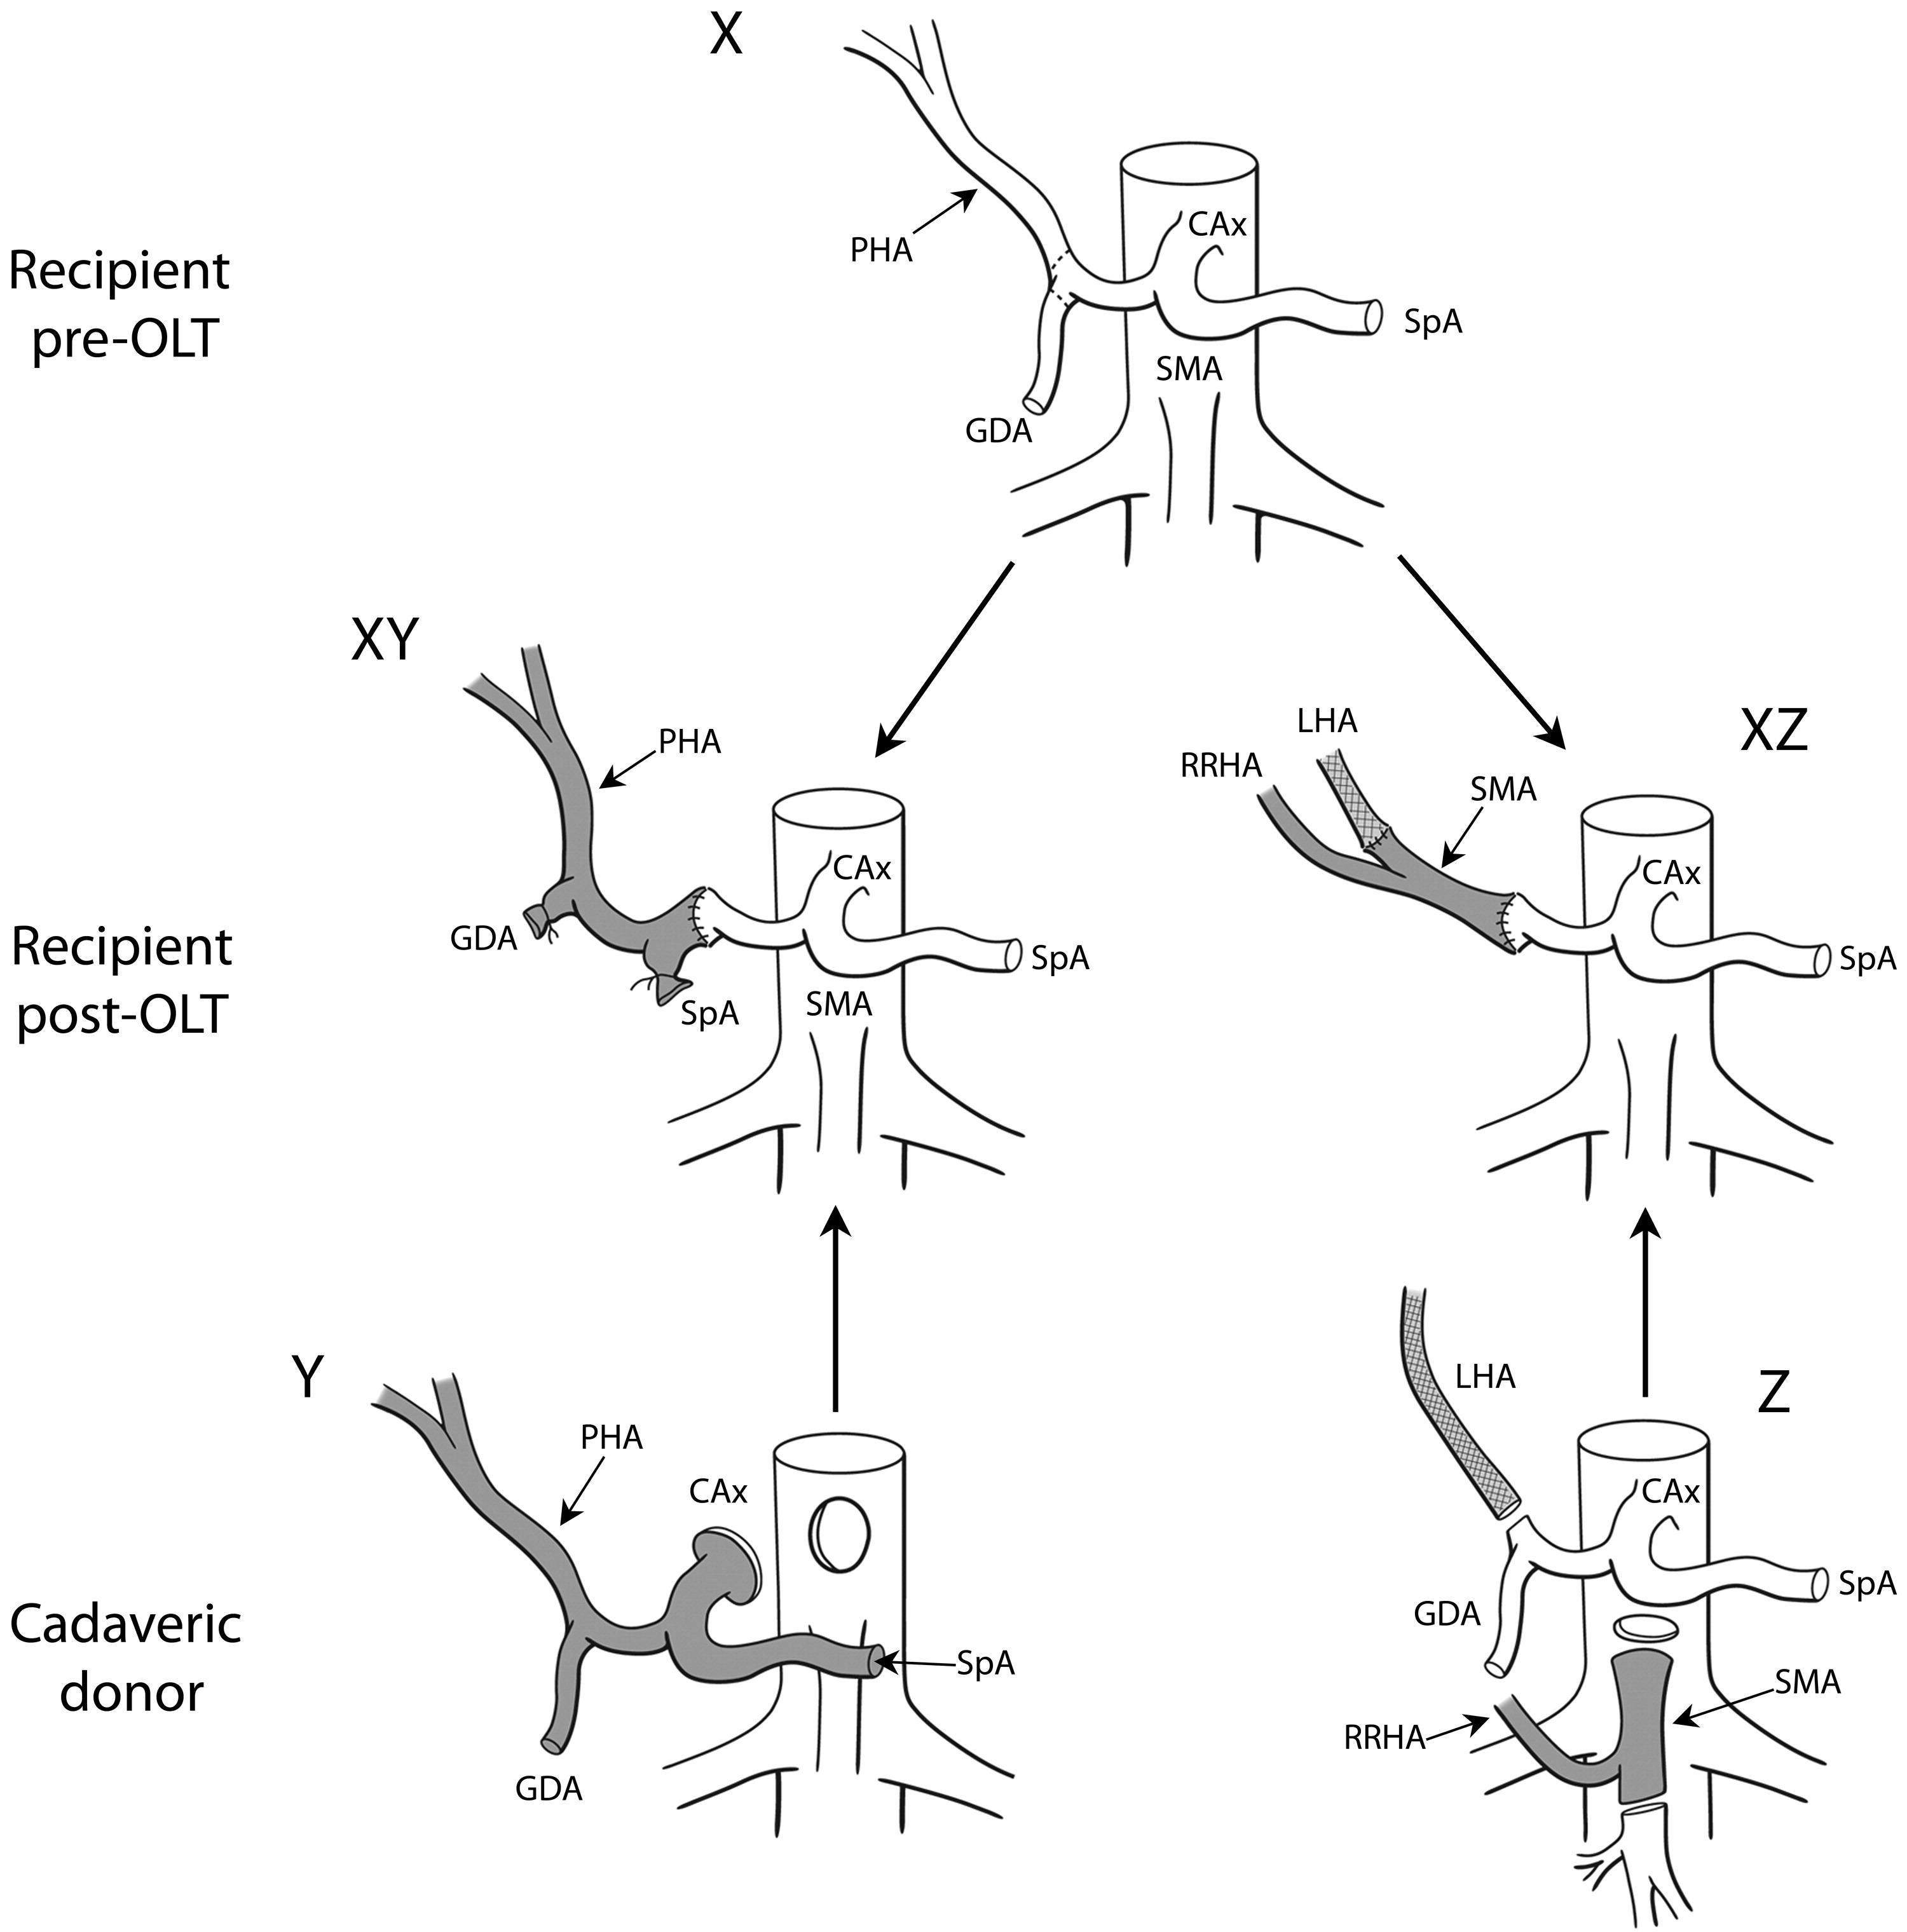 Postliver Transplantation Vascular And Biliary Surgical